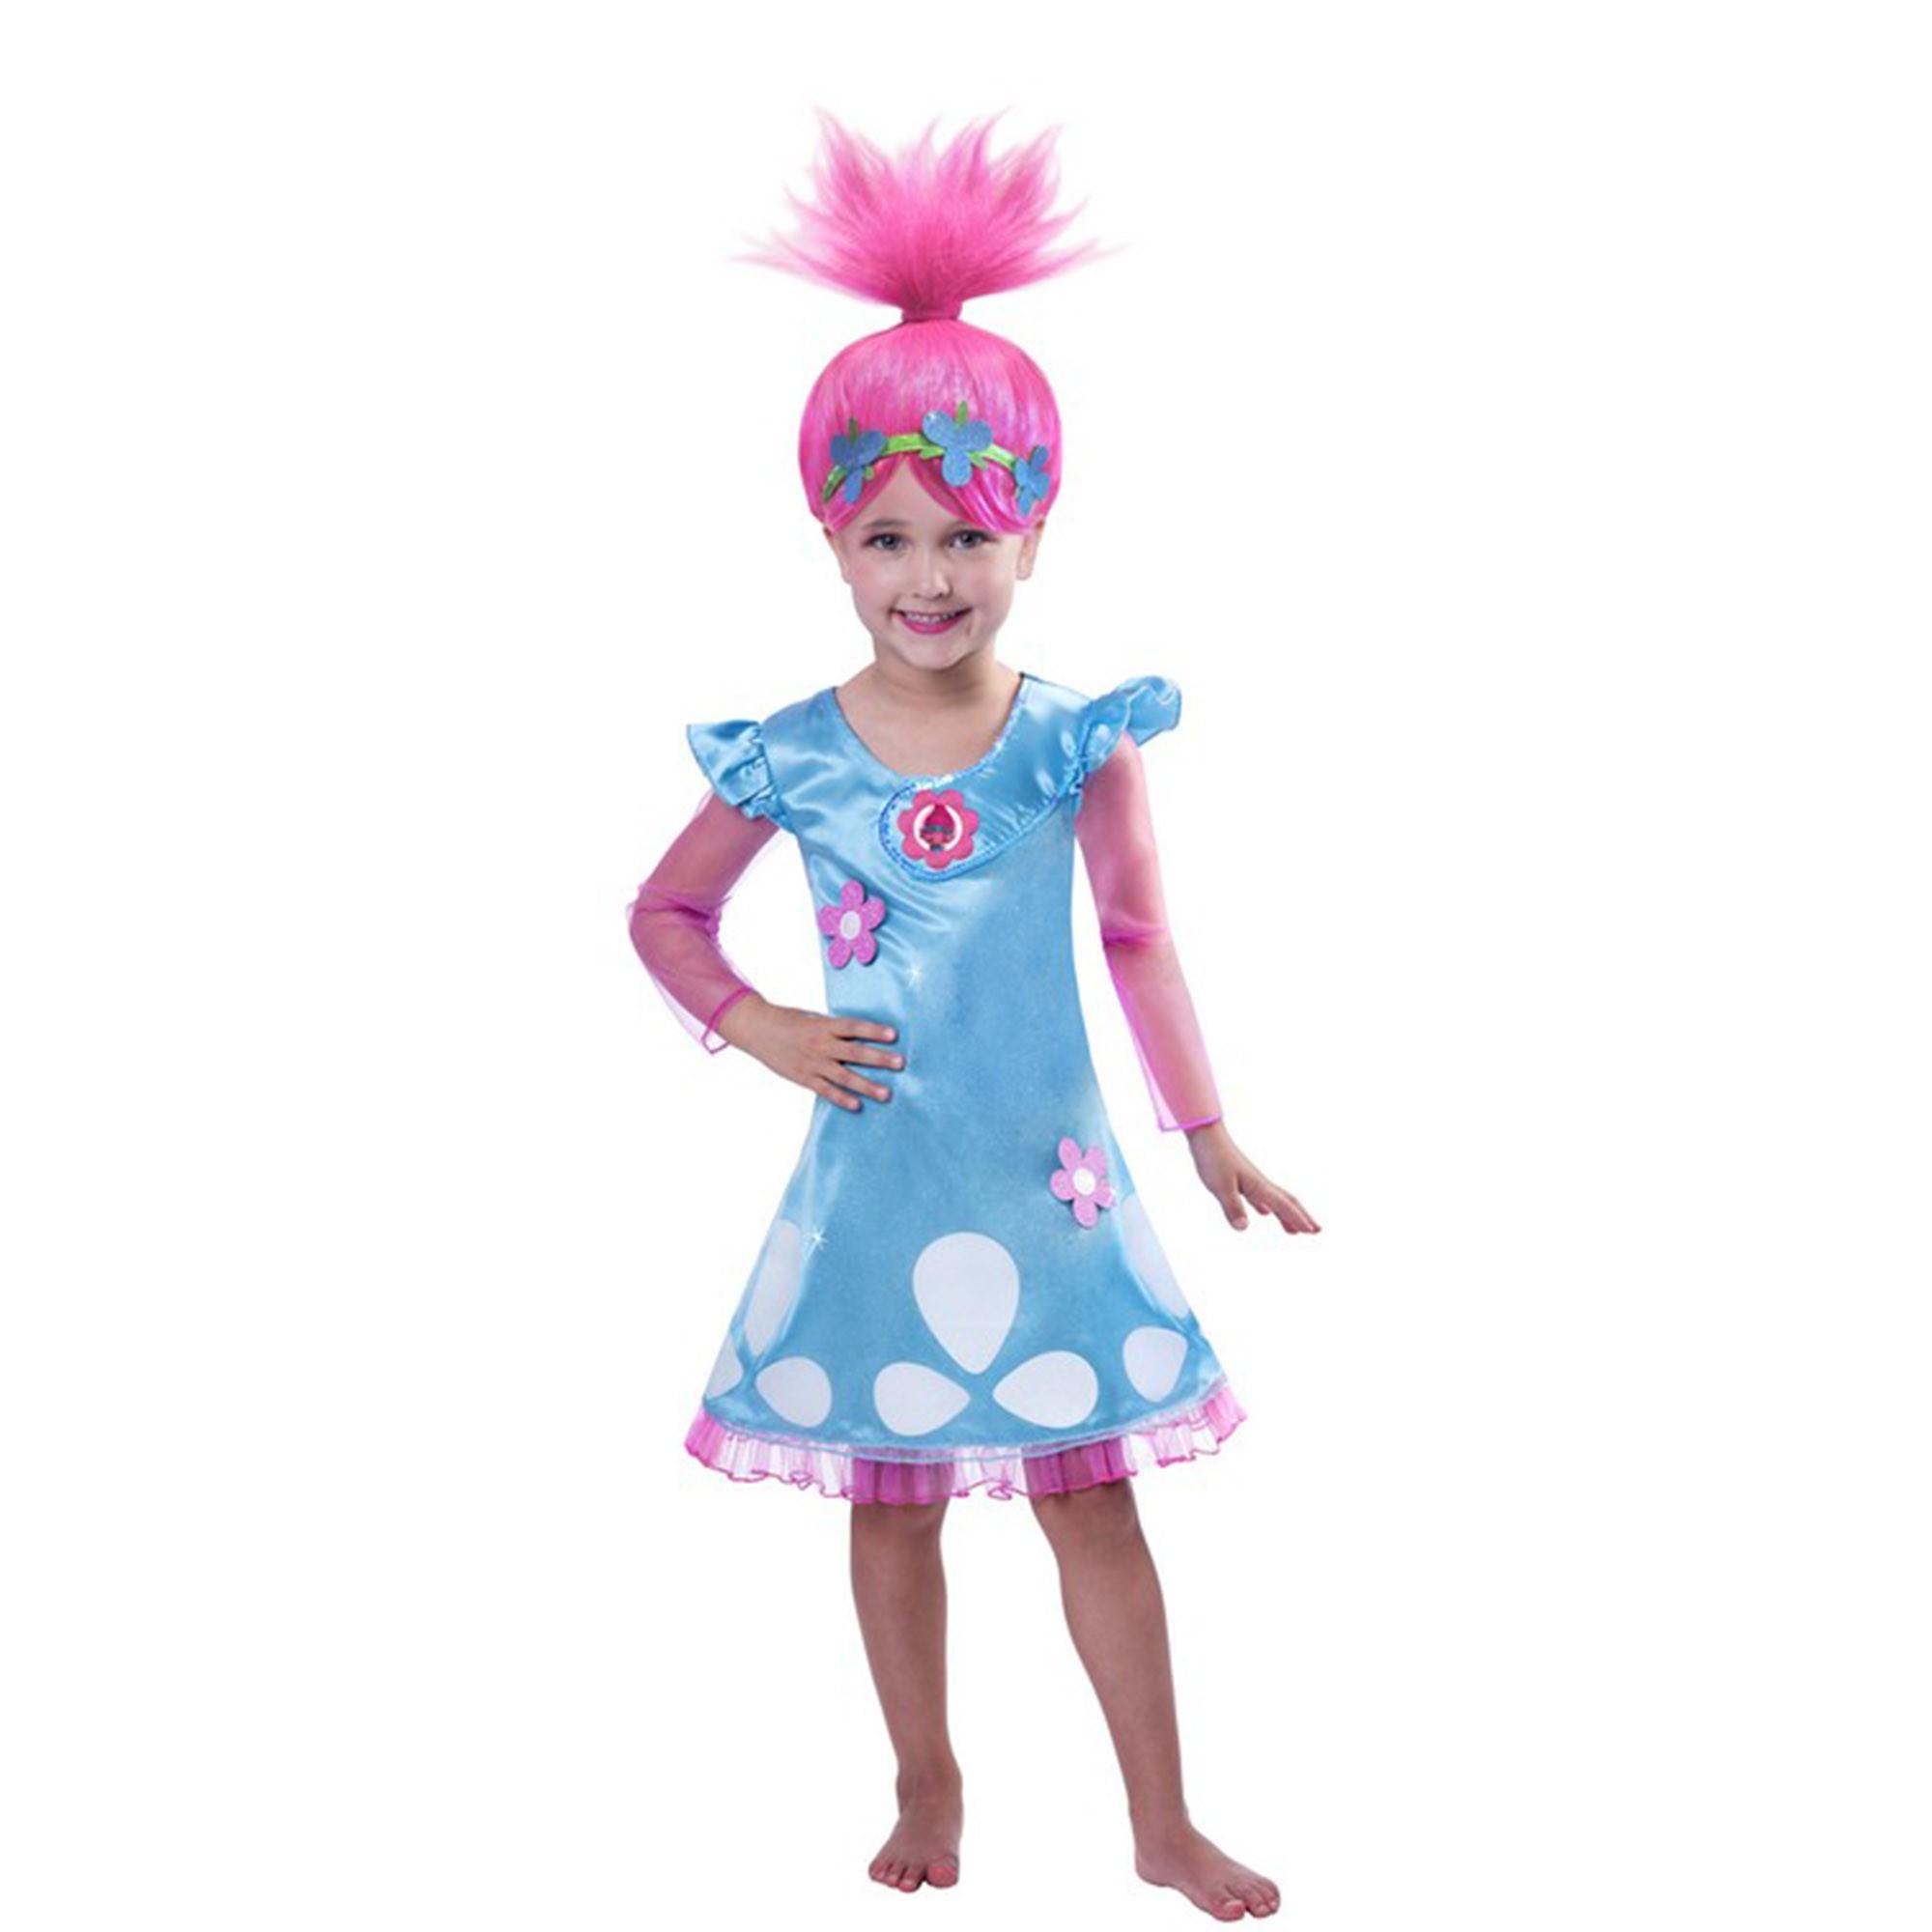 Trolls Girls Poppy Costume & Wig 5-7yrs